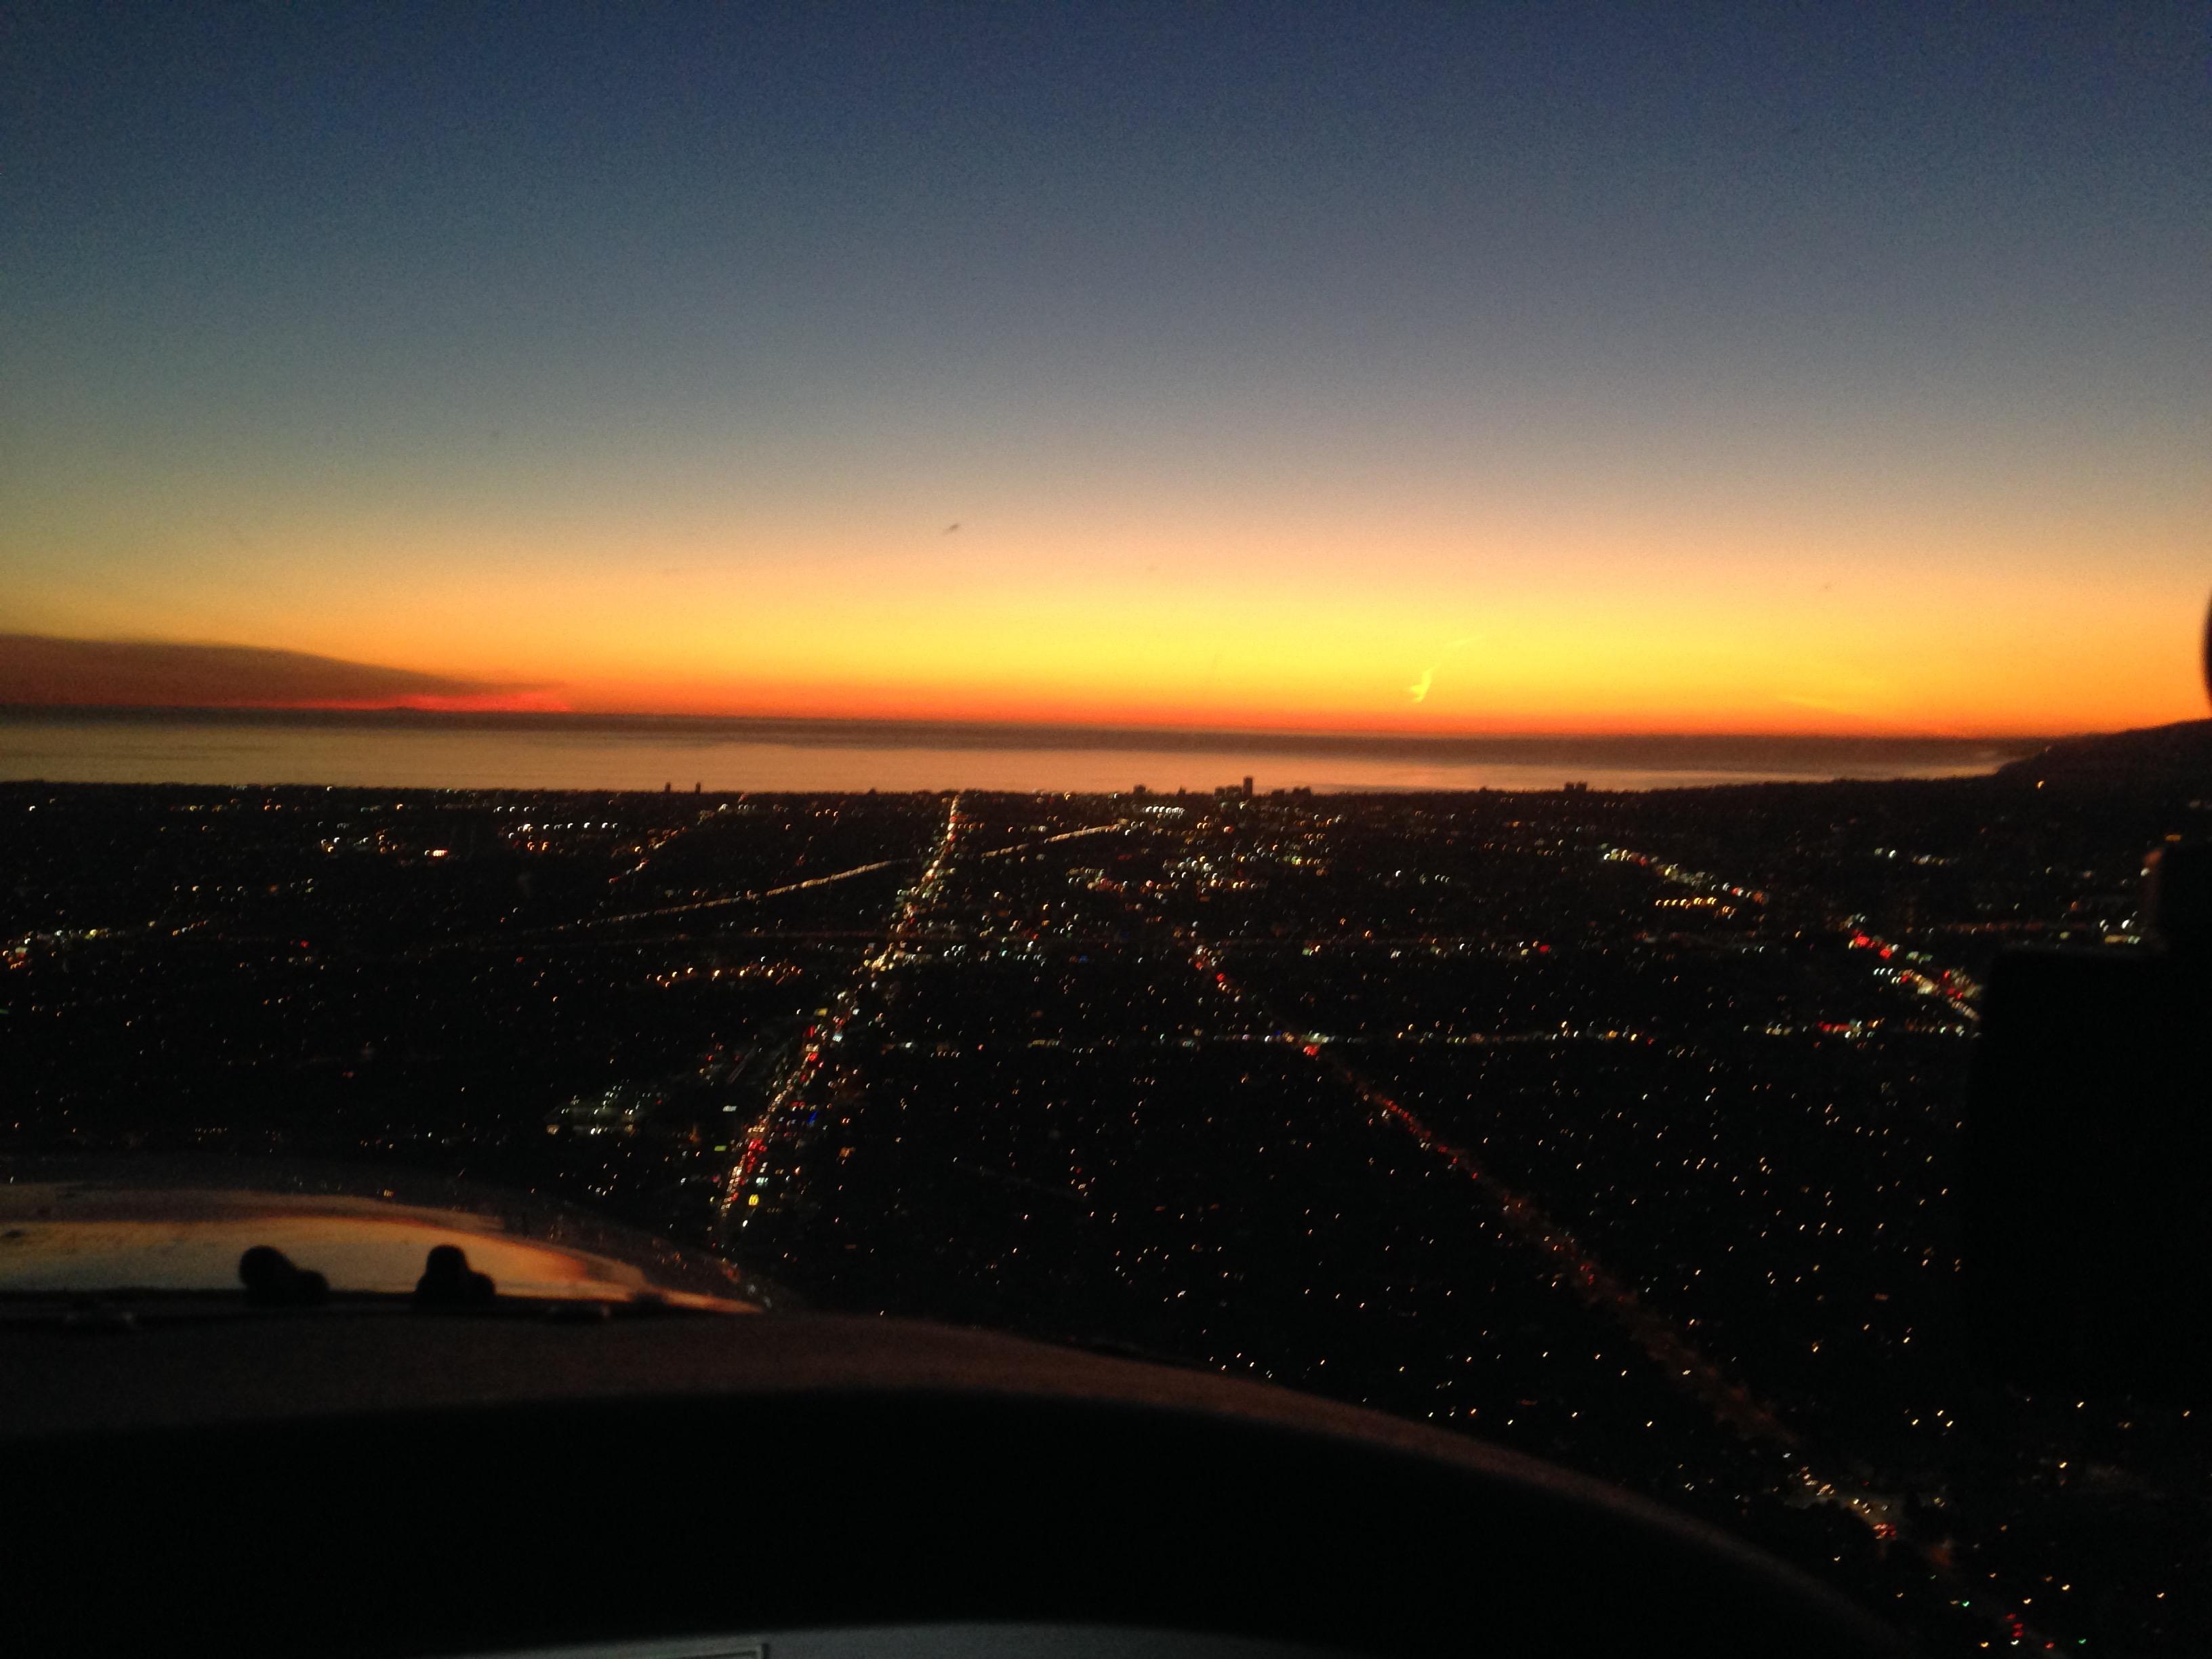 Sunset Rnwy